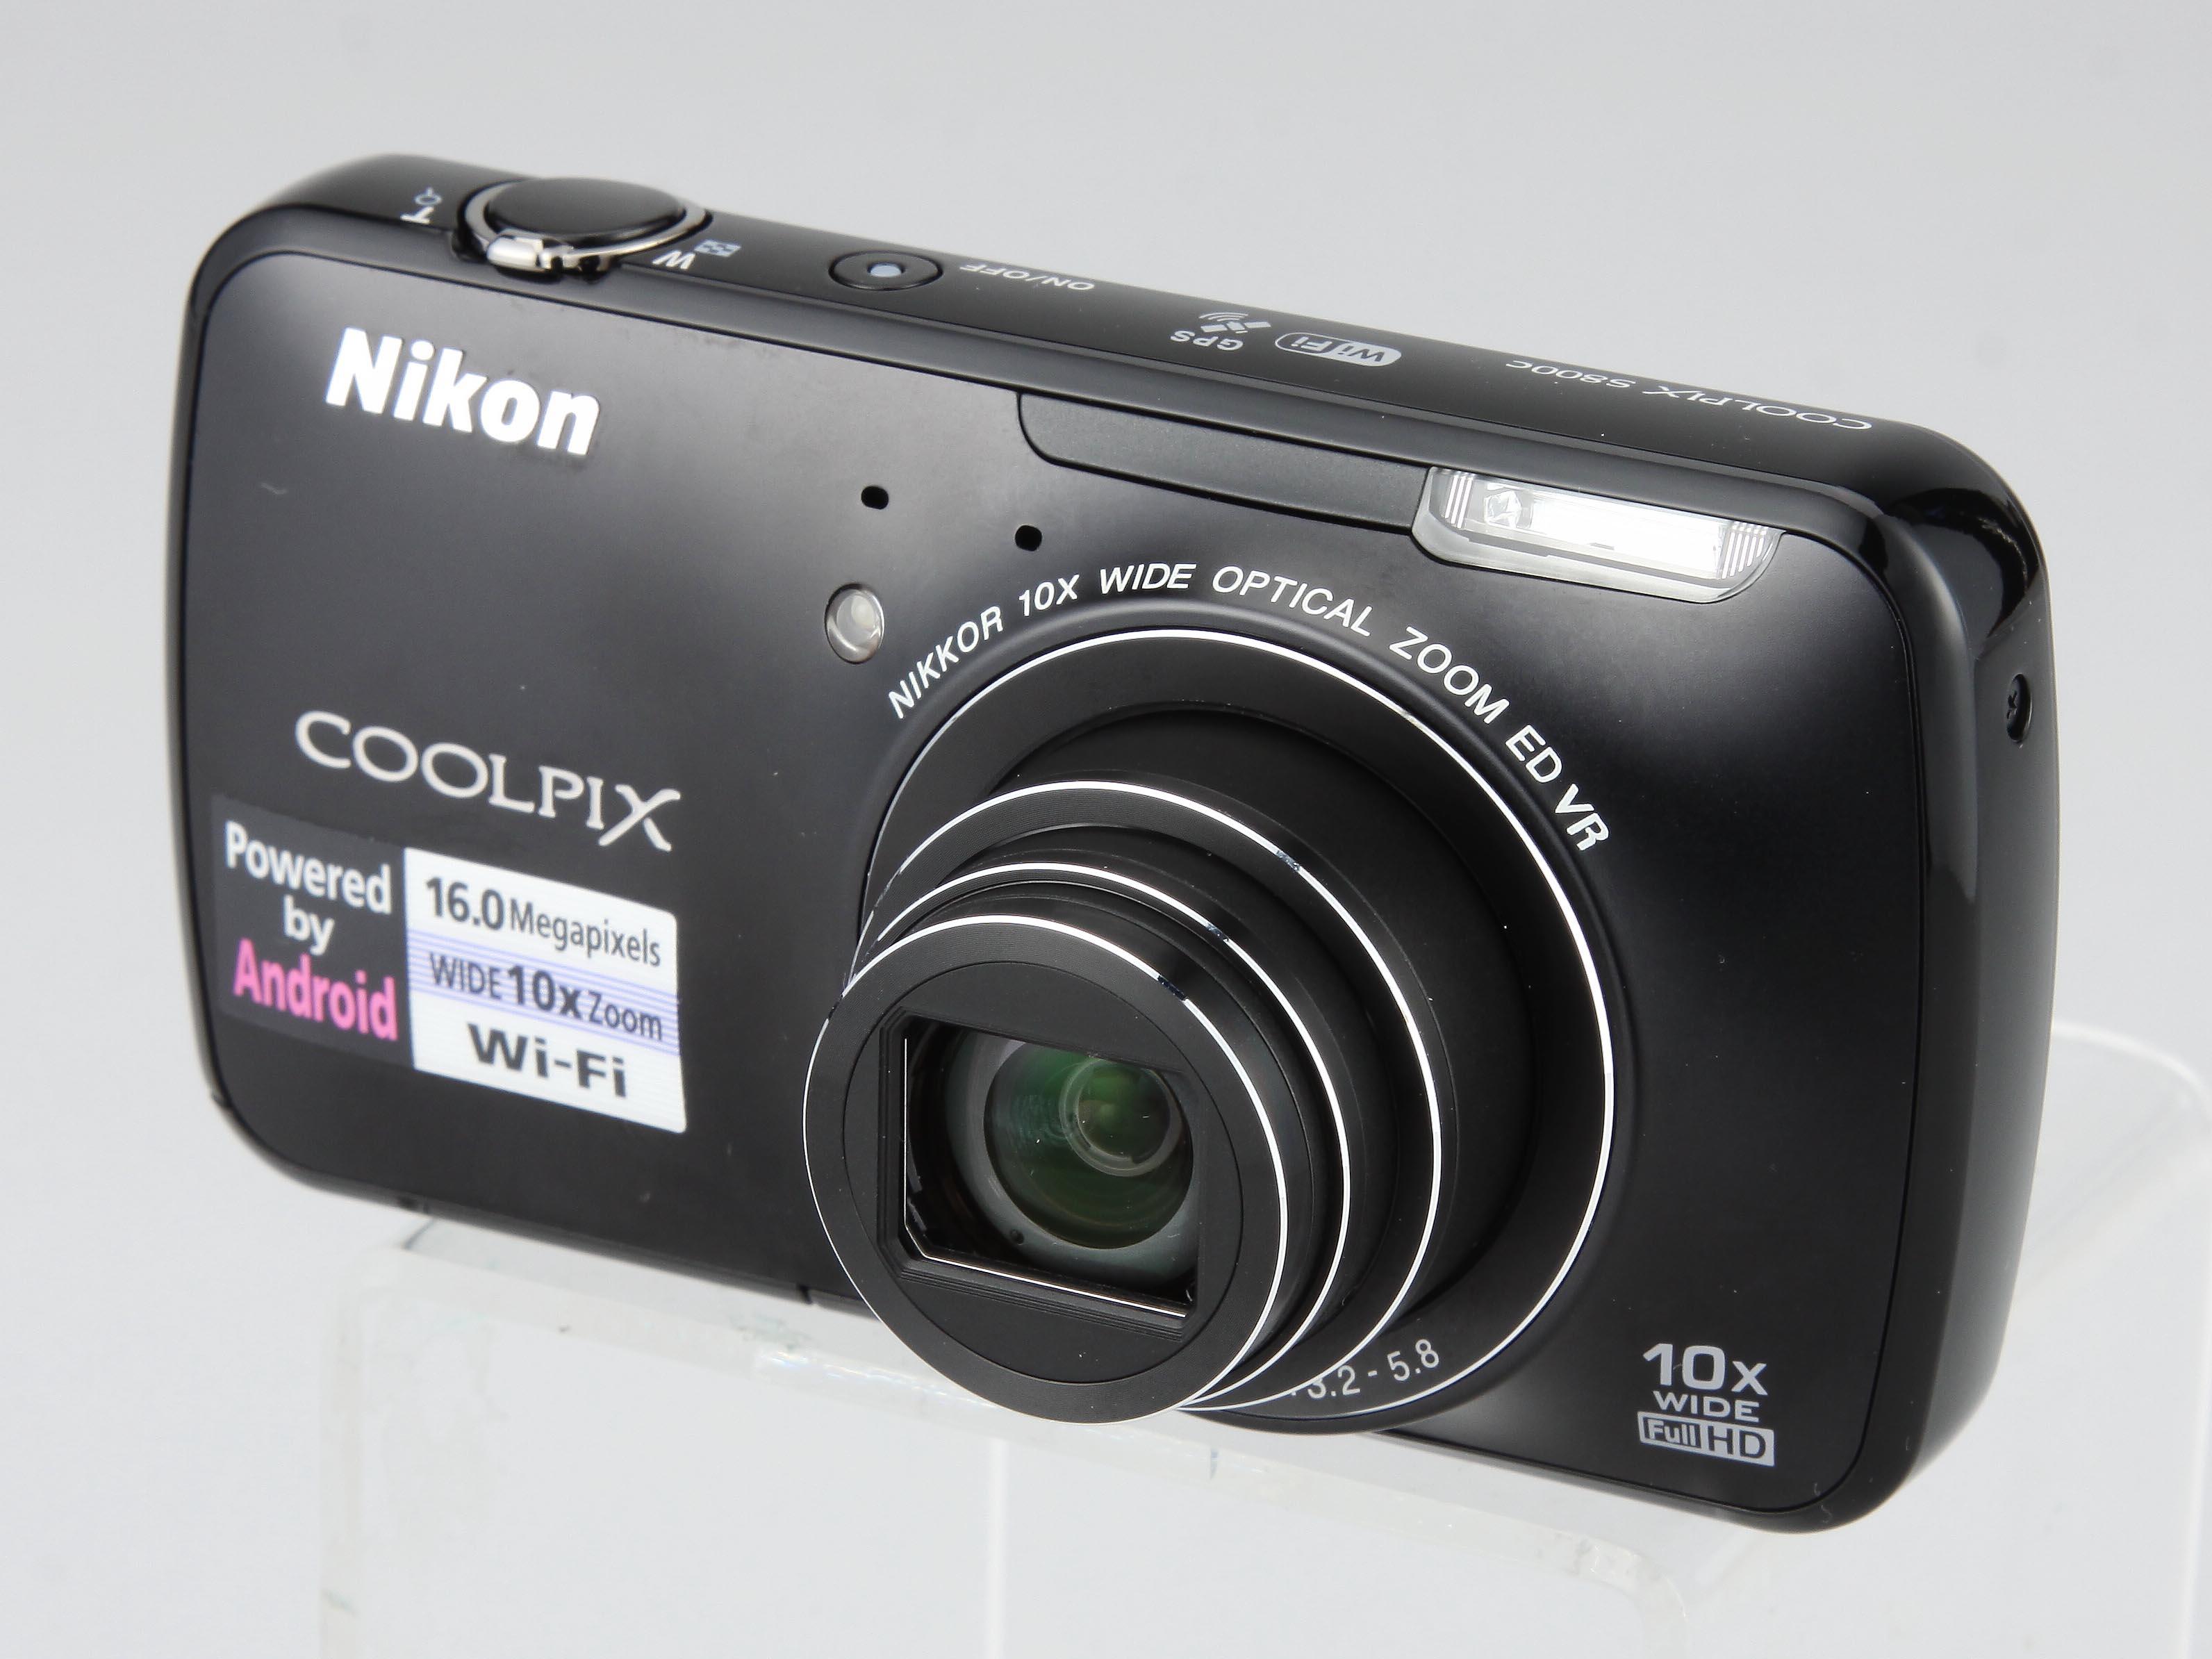 Nikon S800c 評測:世界首款 Android 系統相機,更多新玩法